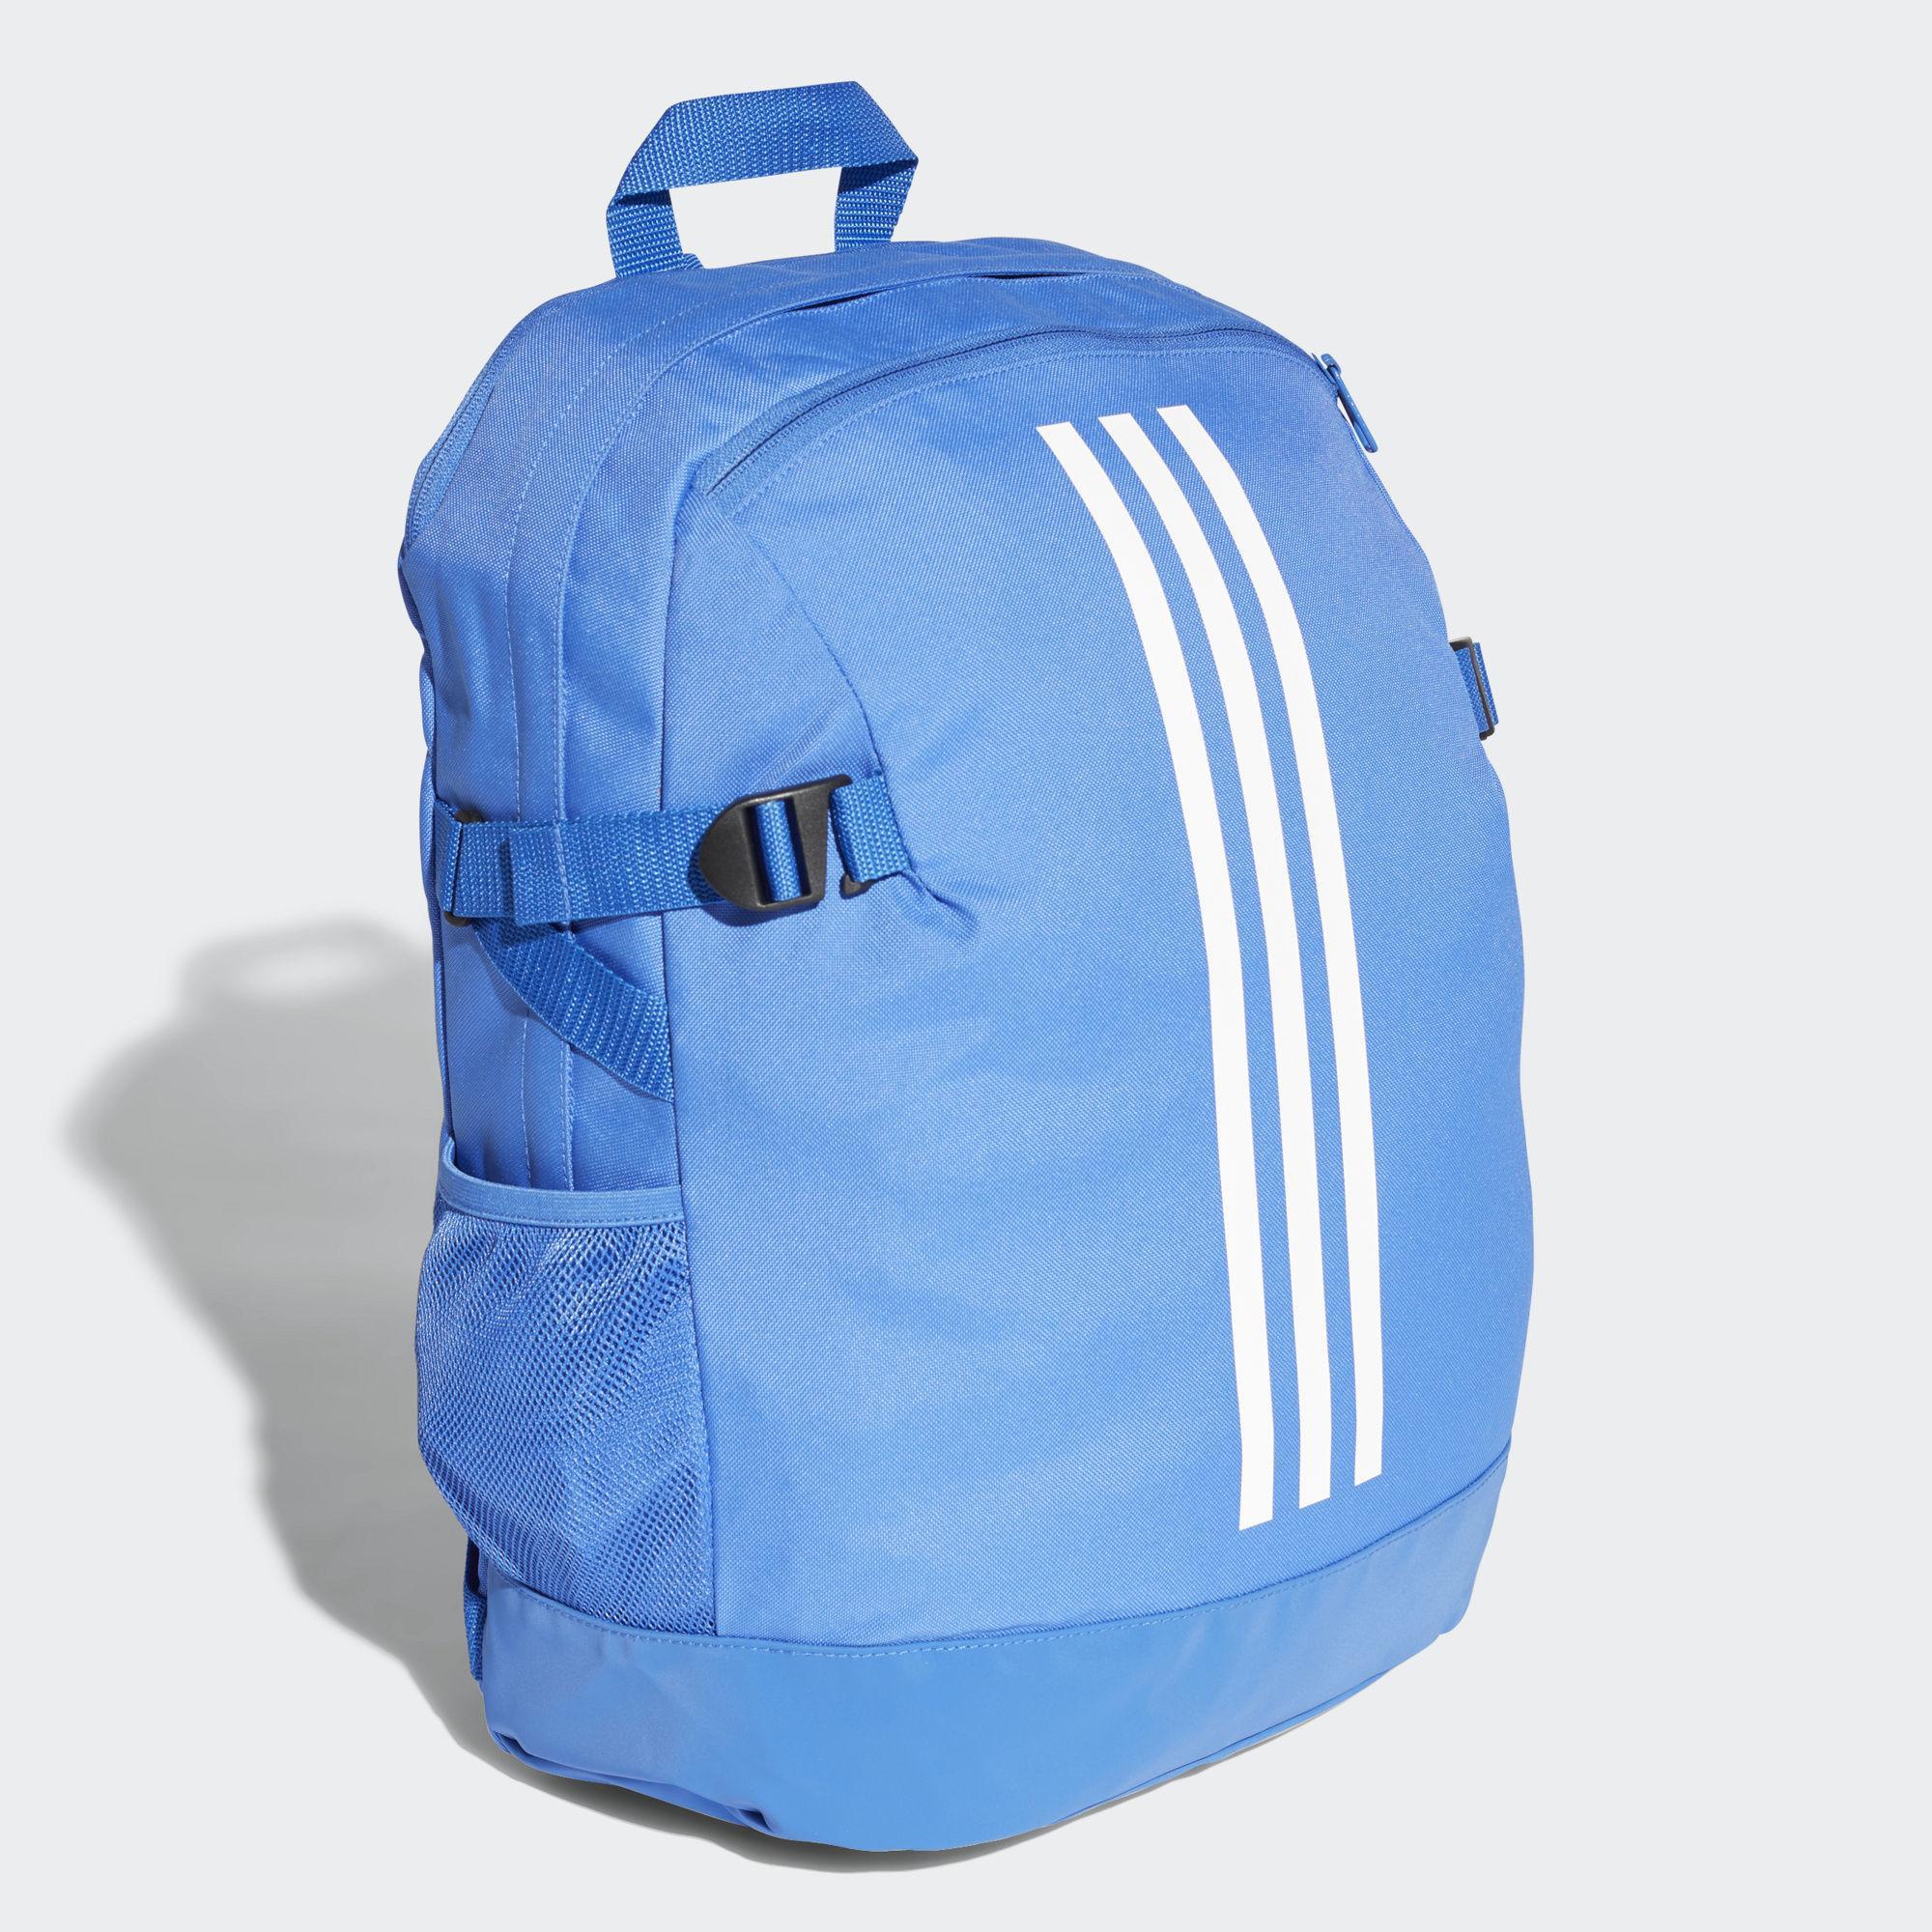 Adidas - Blue 3-stripes Power Backpack Medium for Men - Lyst. View  fullscreen c5c6b1110dca4